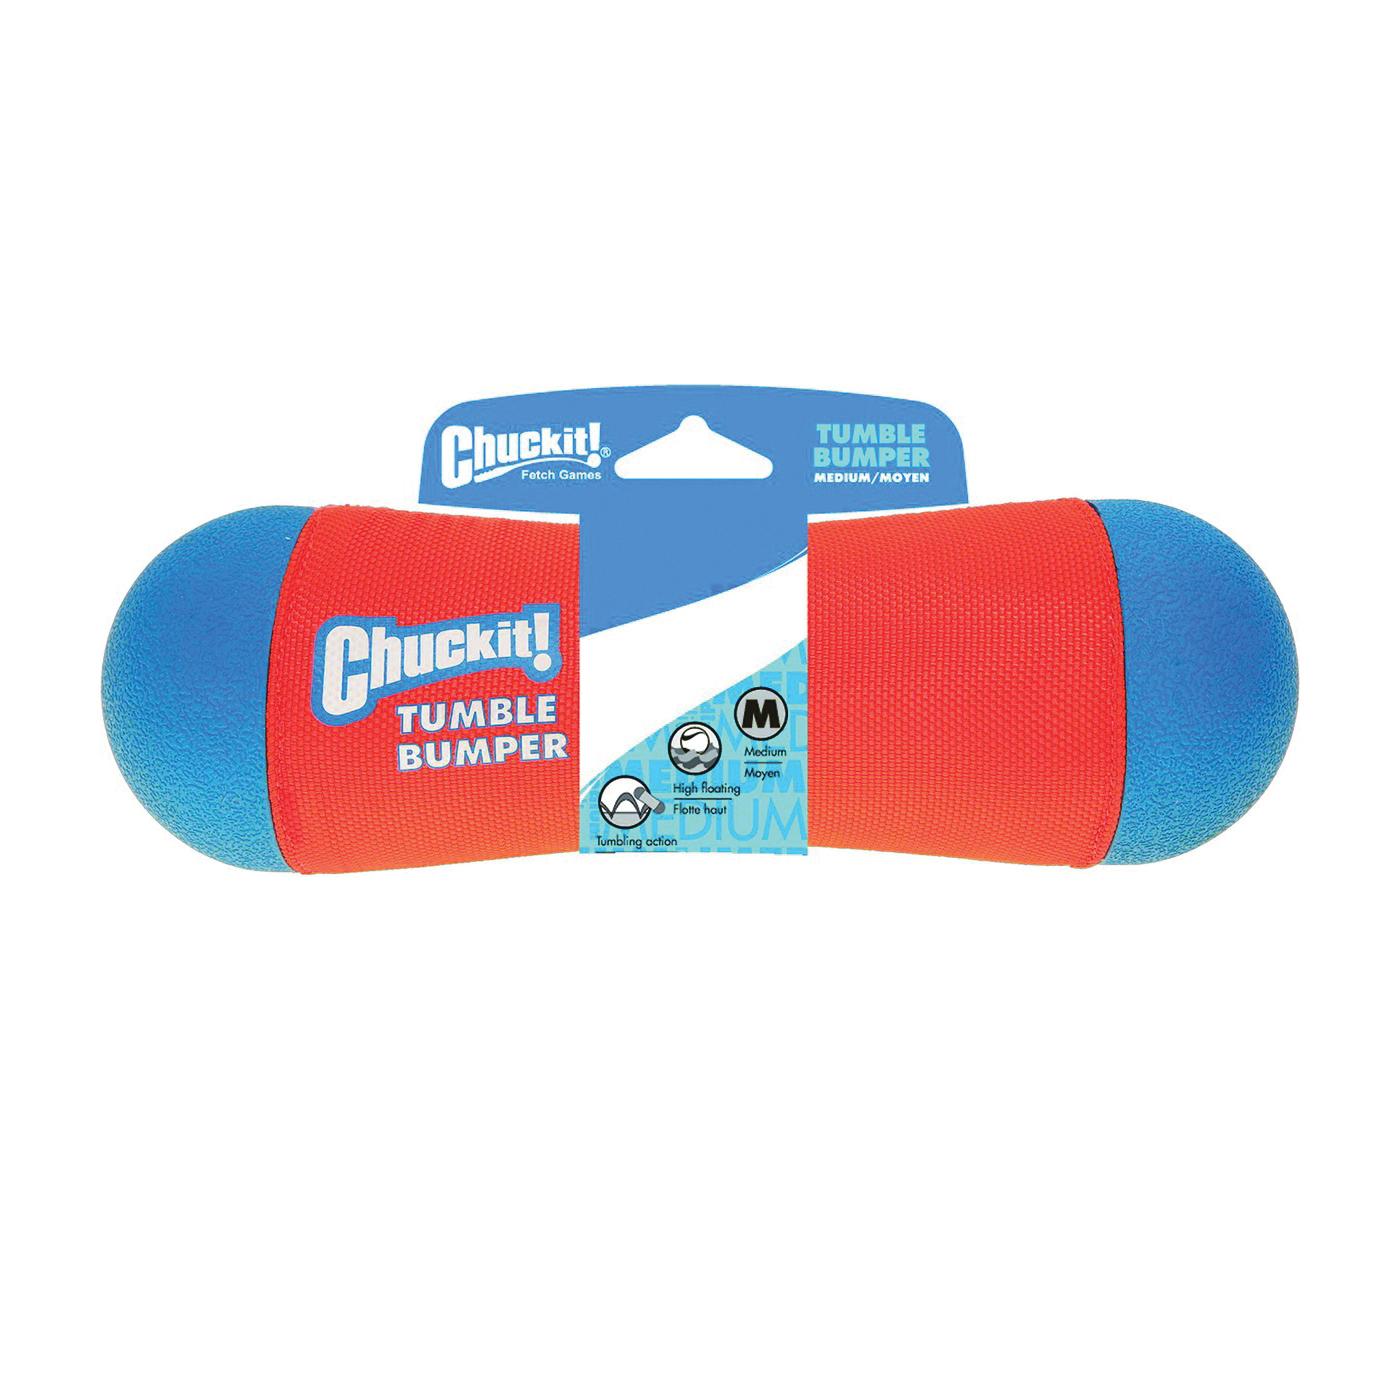 Picture of Chuckit! 184201 Tumble Bumper, M, Foam/Polyester/Rubber, Blue/Orange